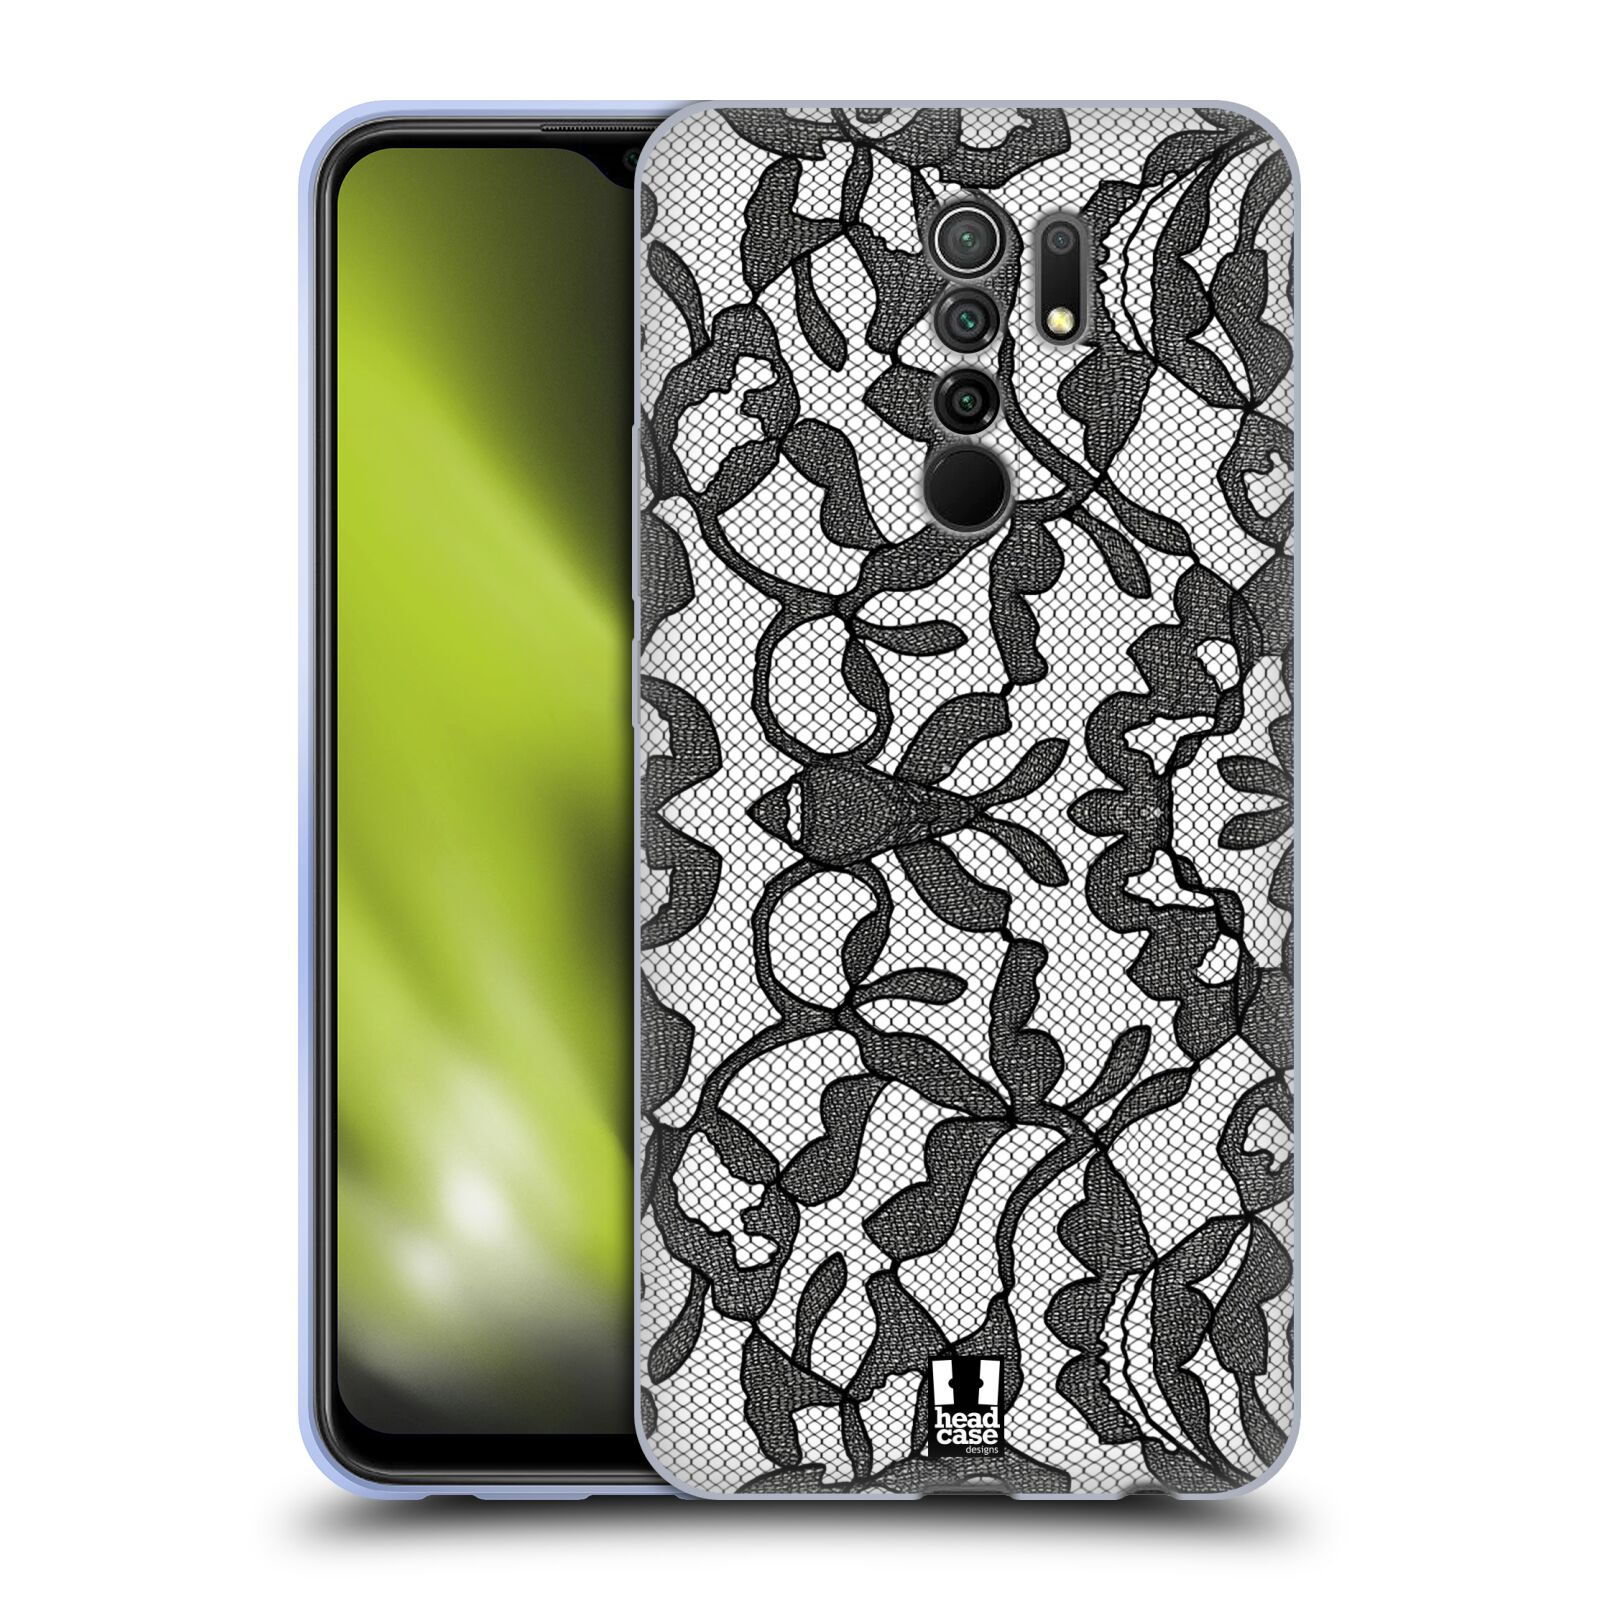 Silikonové pouzdro na mobil Xiaomi Redmi 9 - Head Case - LEAFY KRAJKA